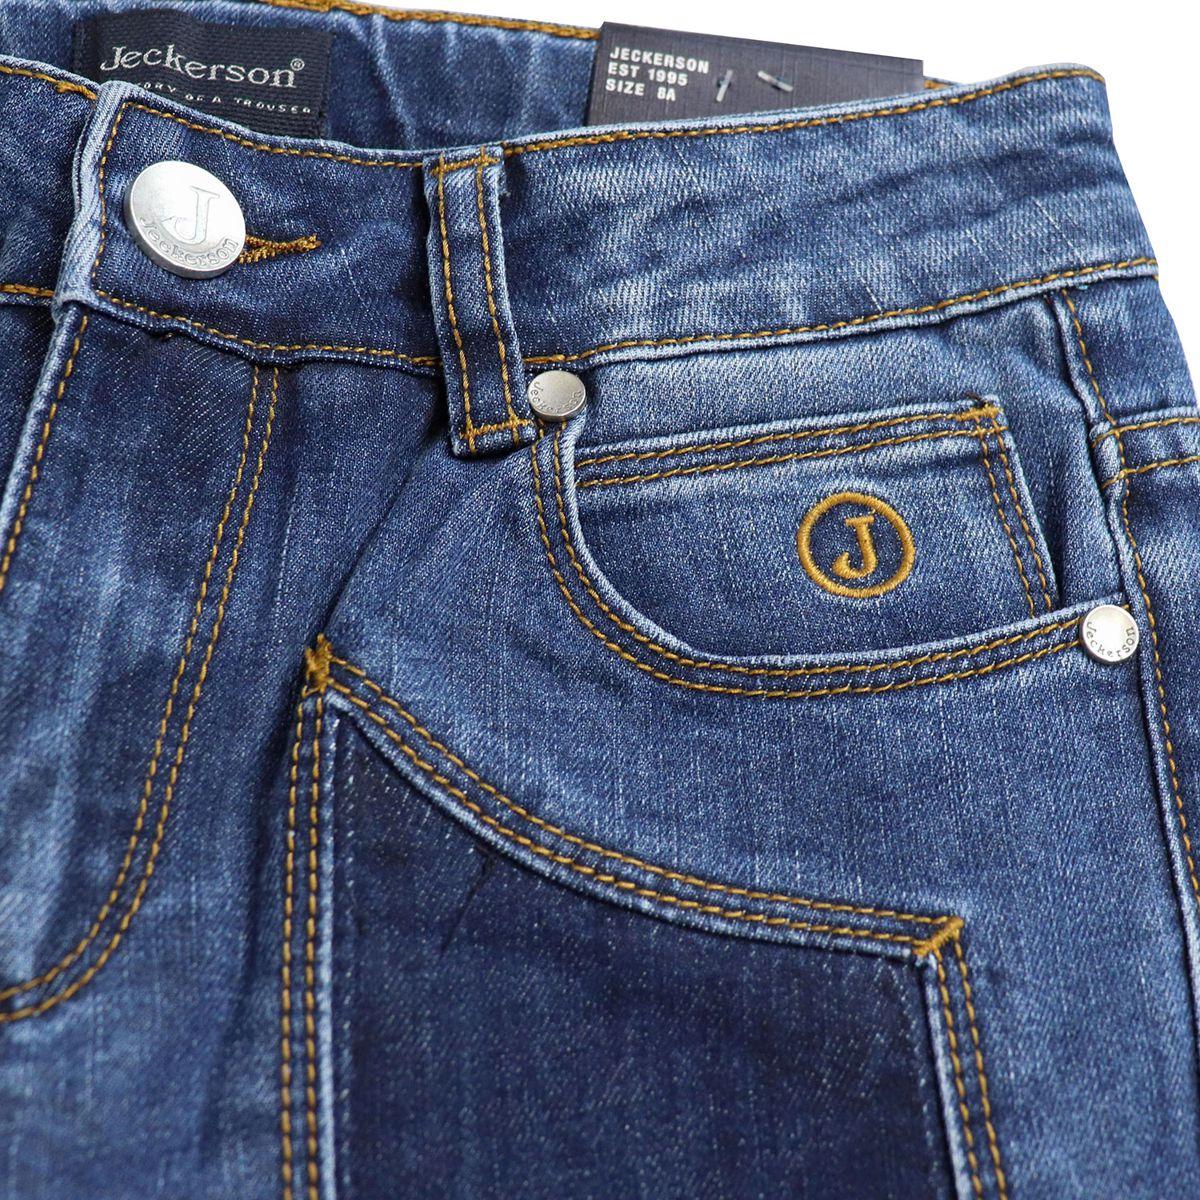 5-pocket jeans with contrasting dark denim patches Light denim Jeckerson